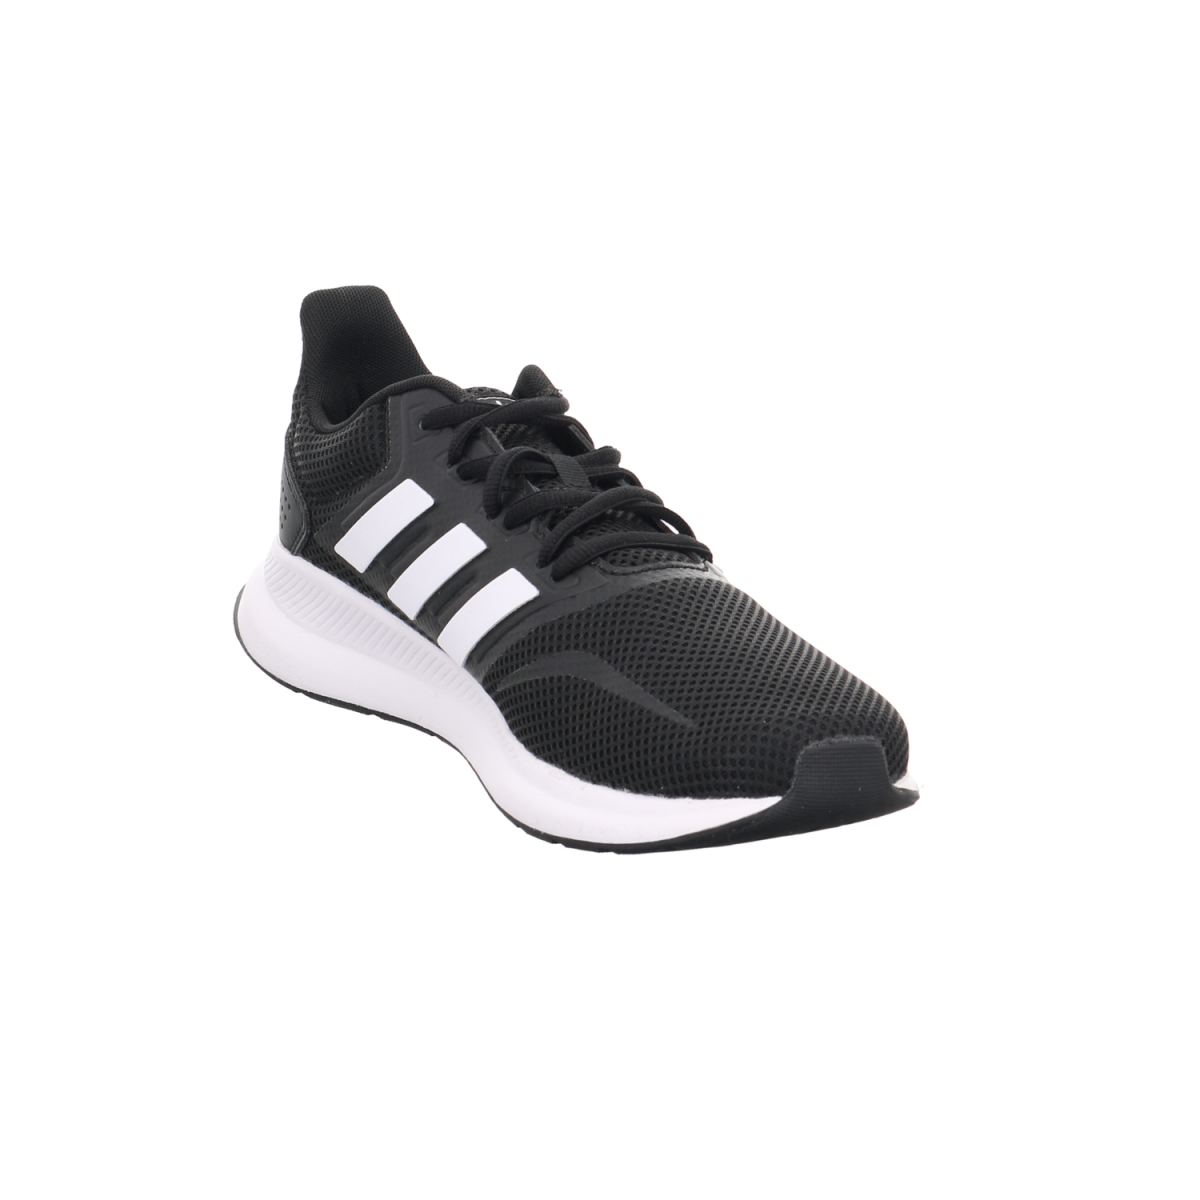 callejón Plasticidad Hacer  Adidas   F36199   Hillenhinrichs-Schuhmode.de